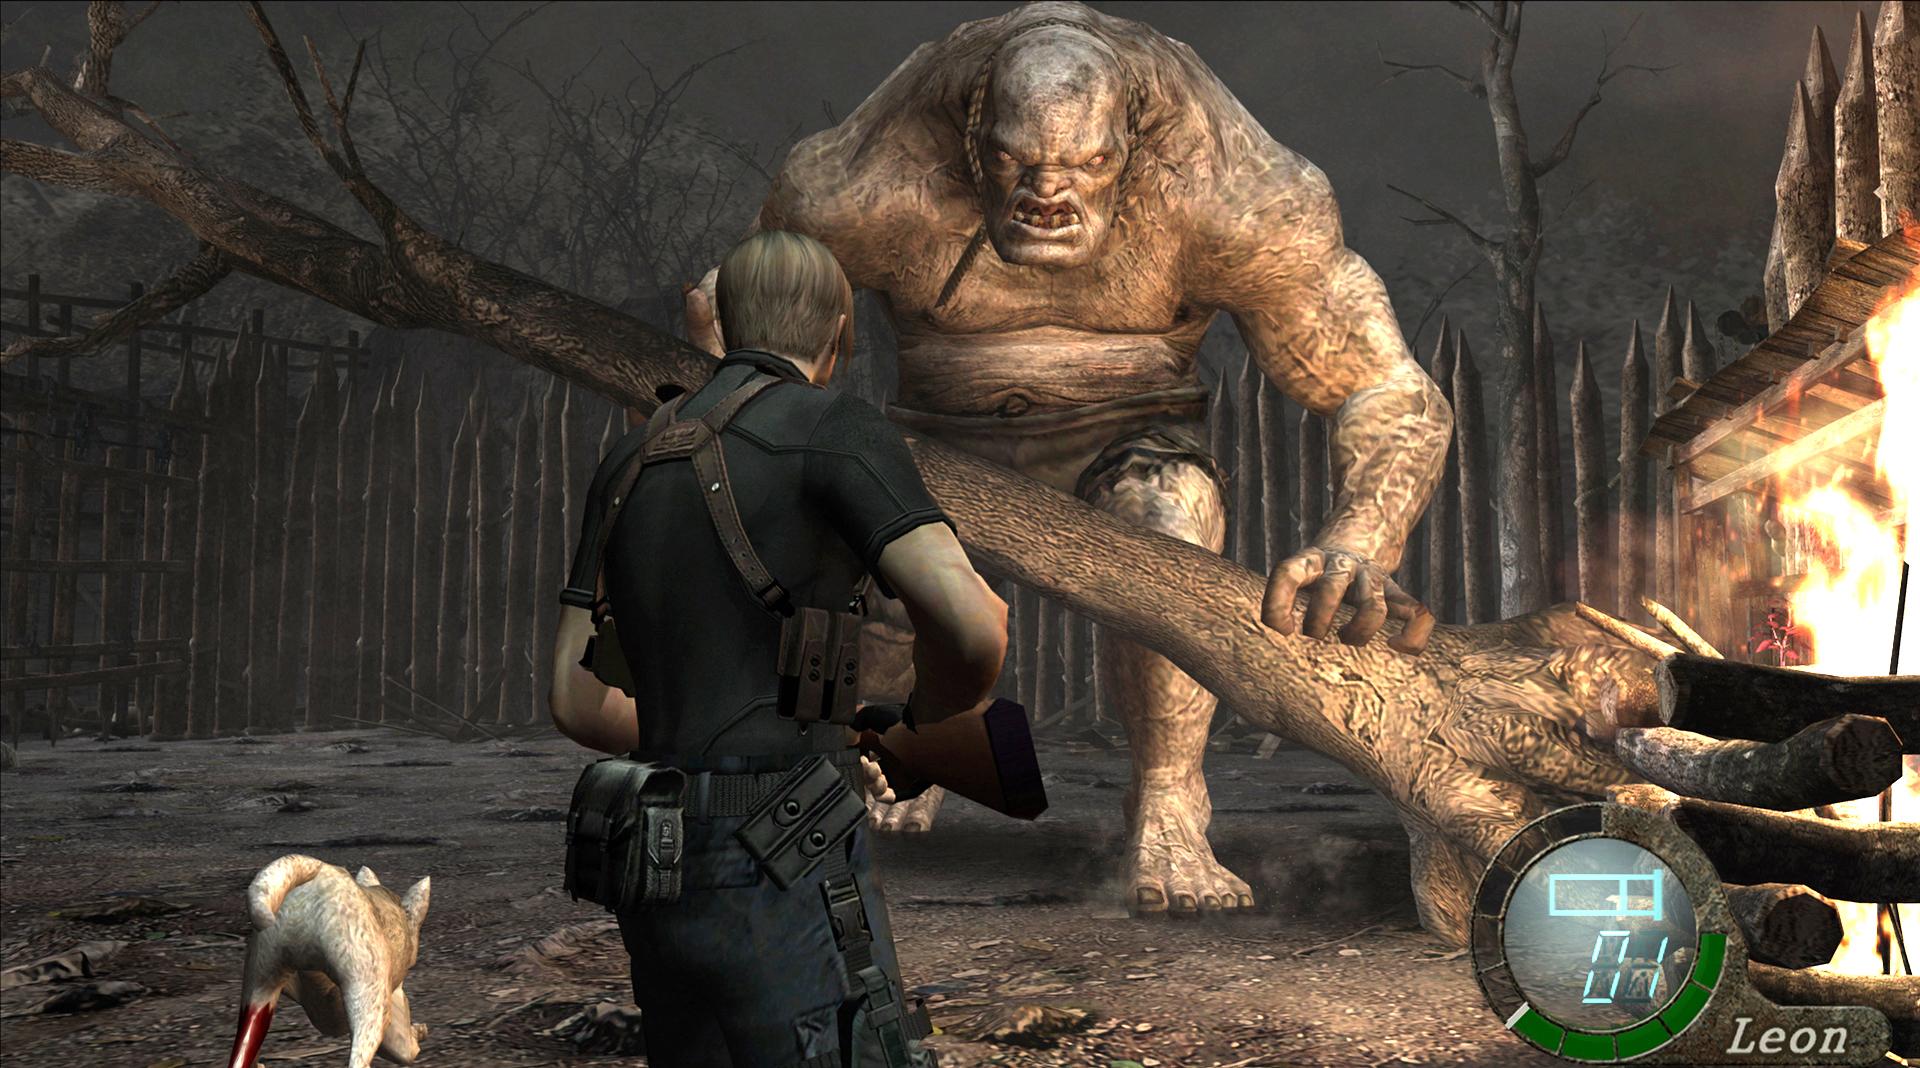 Retrospective Resident Evil 4 Gaming History 101